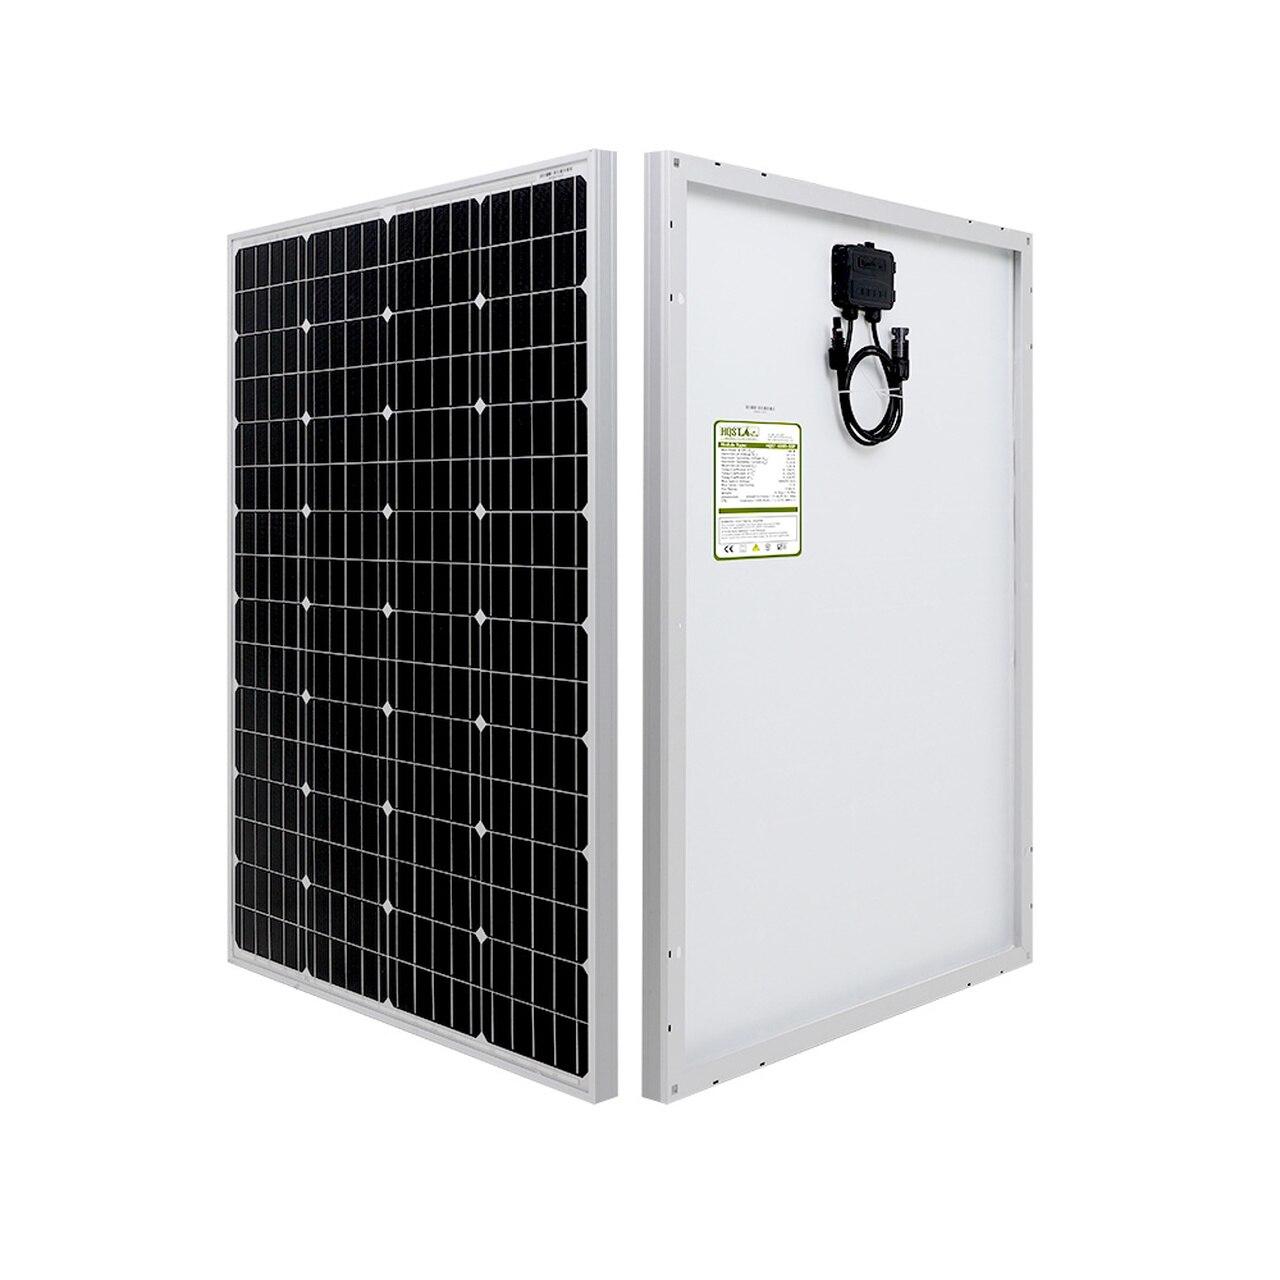 HQST 100 WATT 12 VOLT MONO SOLAR PANEL solar panel